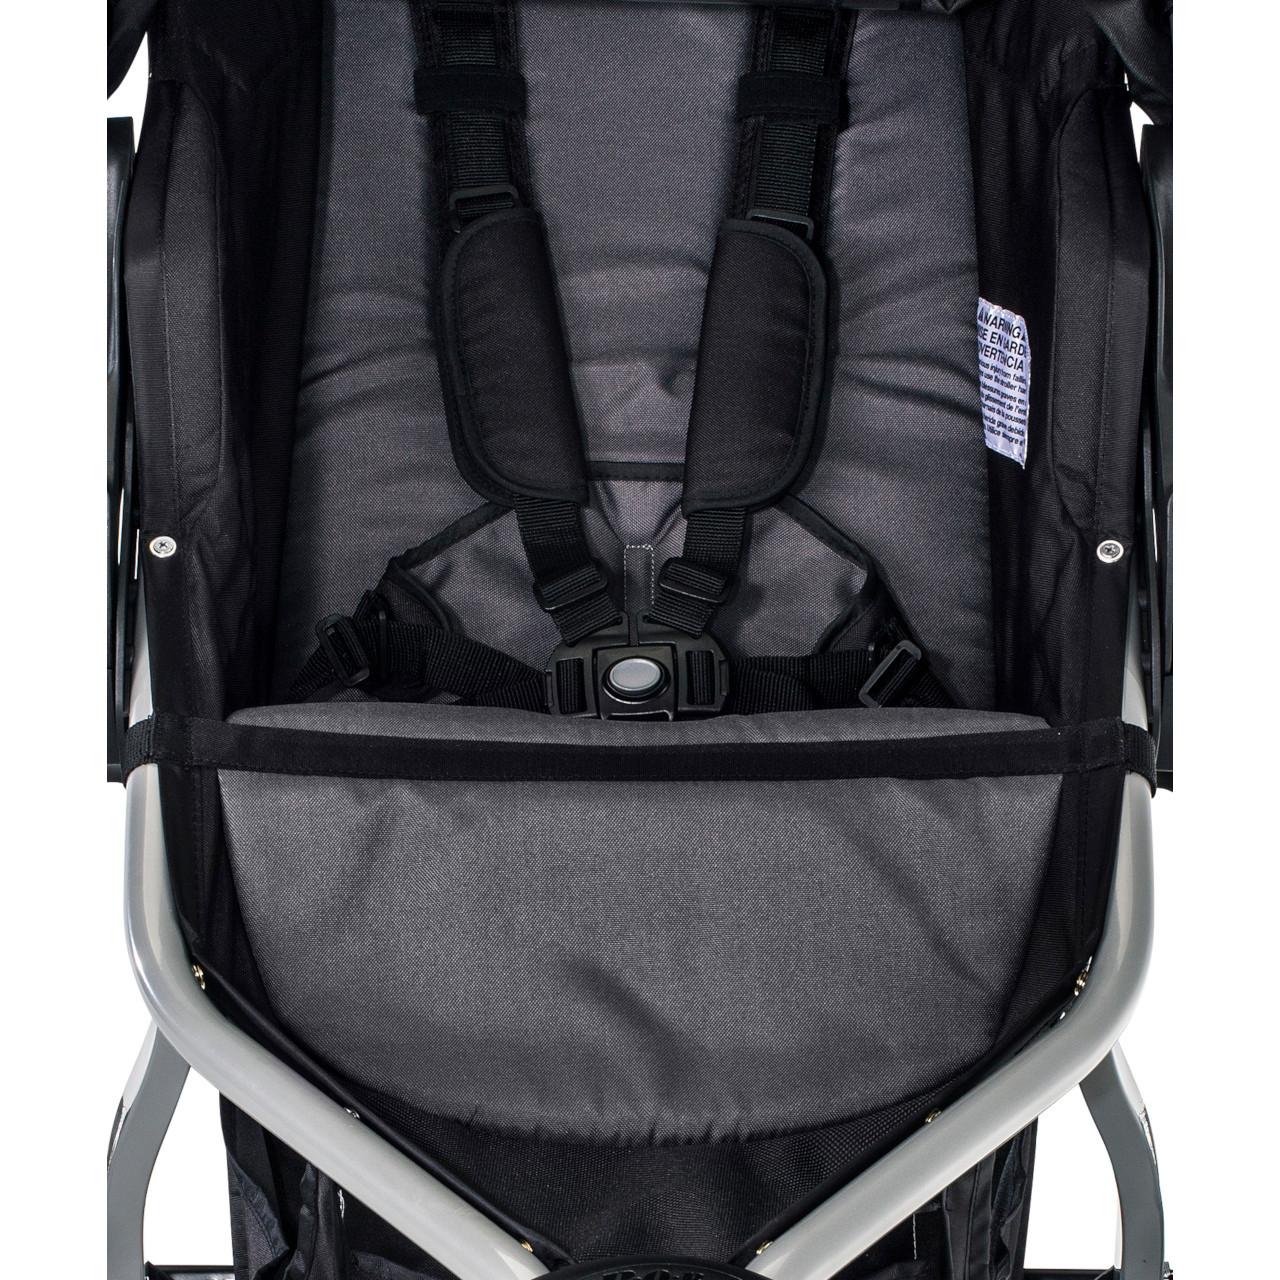 BOB Rambler Seat Single/Black (canopy & lowboy sold separately)